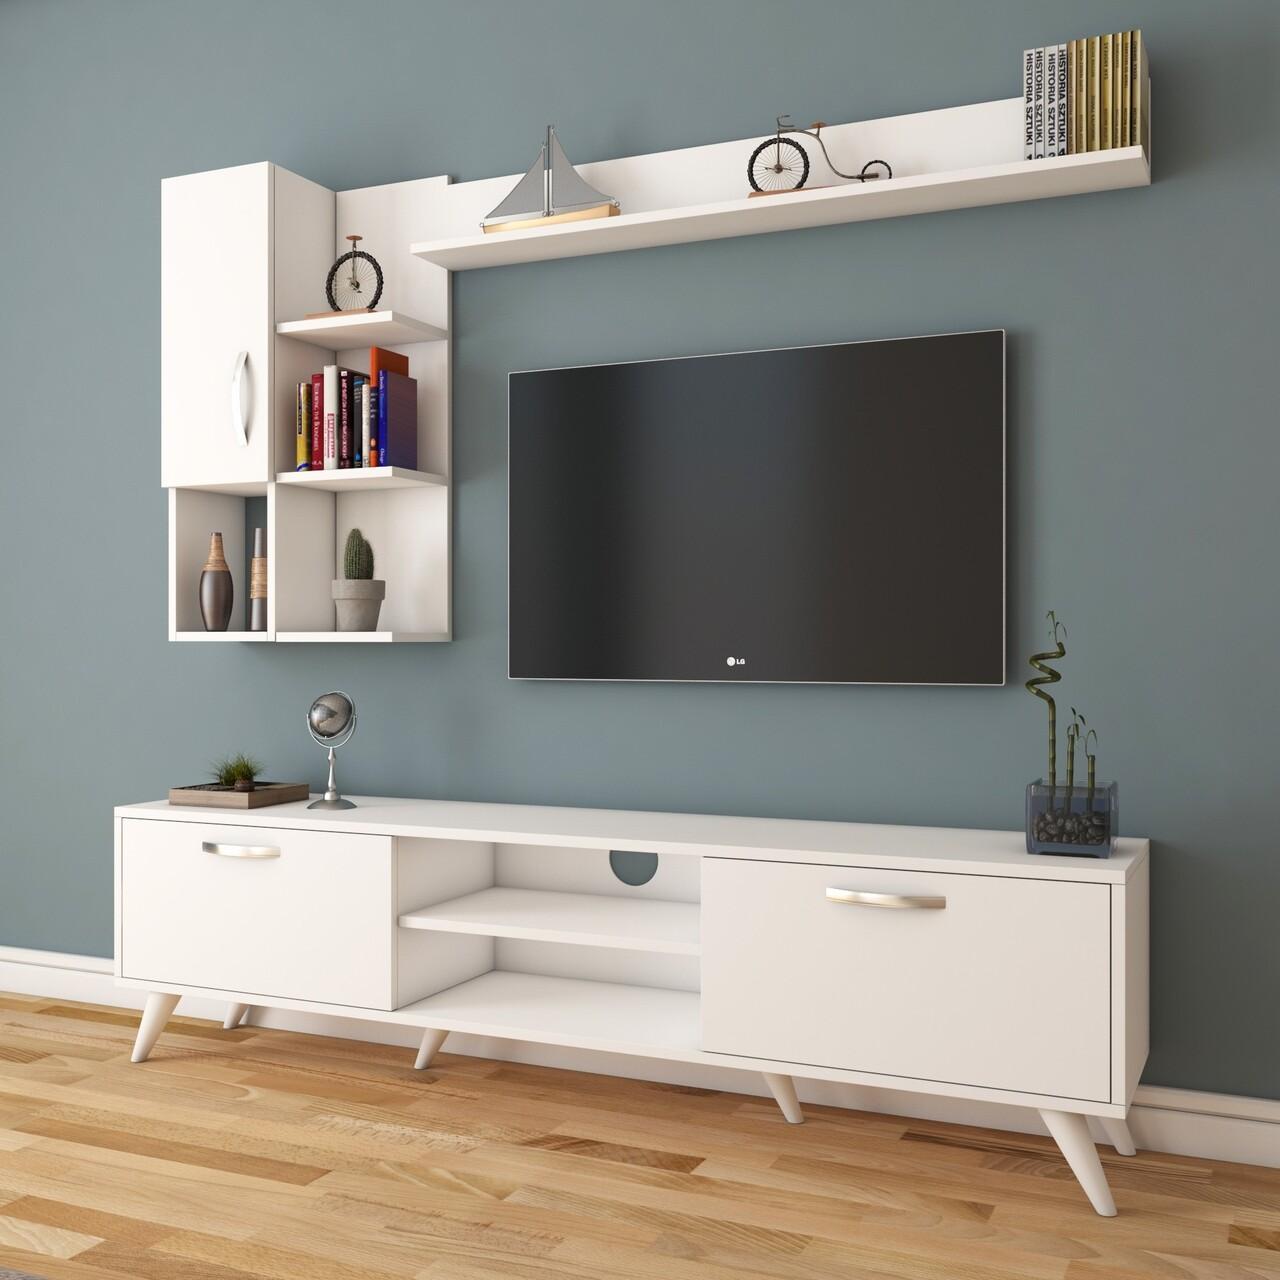 Comoda TV cu 2 rafturi de perete si cabinet M33 - 293, Wren, 180 x 35 x 48.6 cm/90 cm/133 cm, white